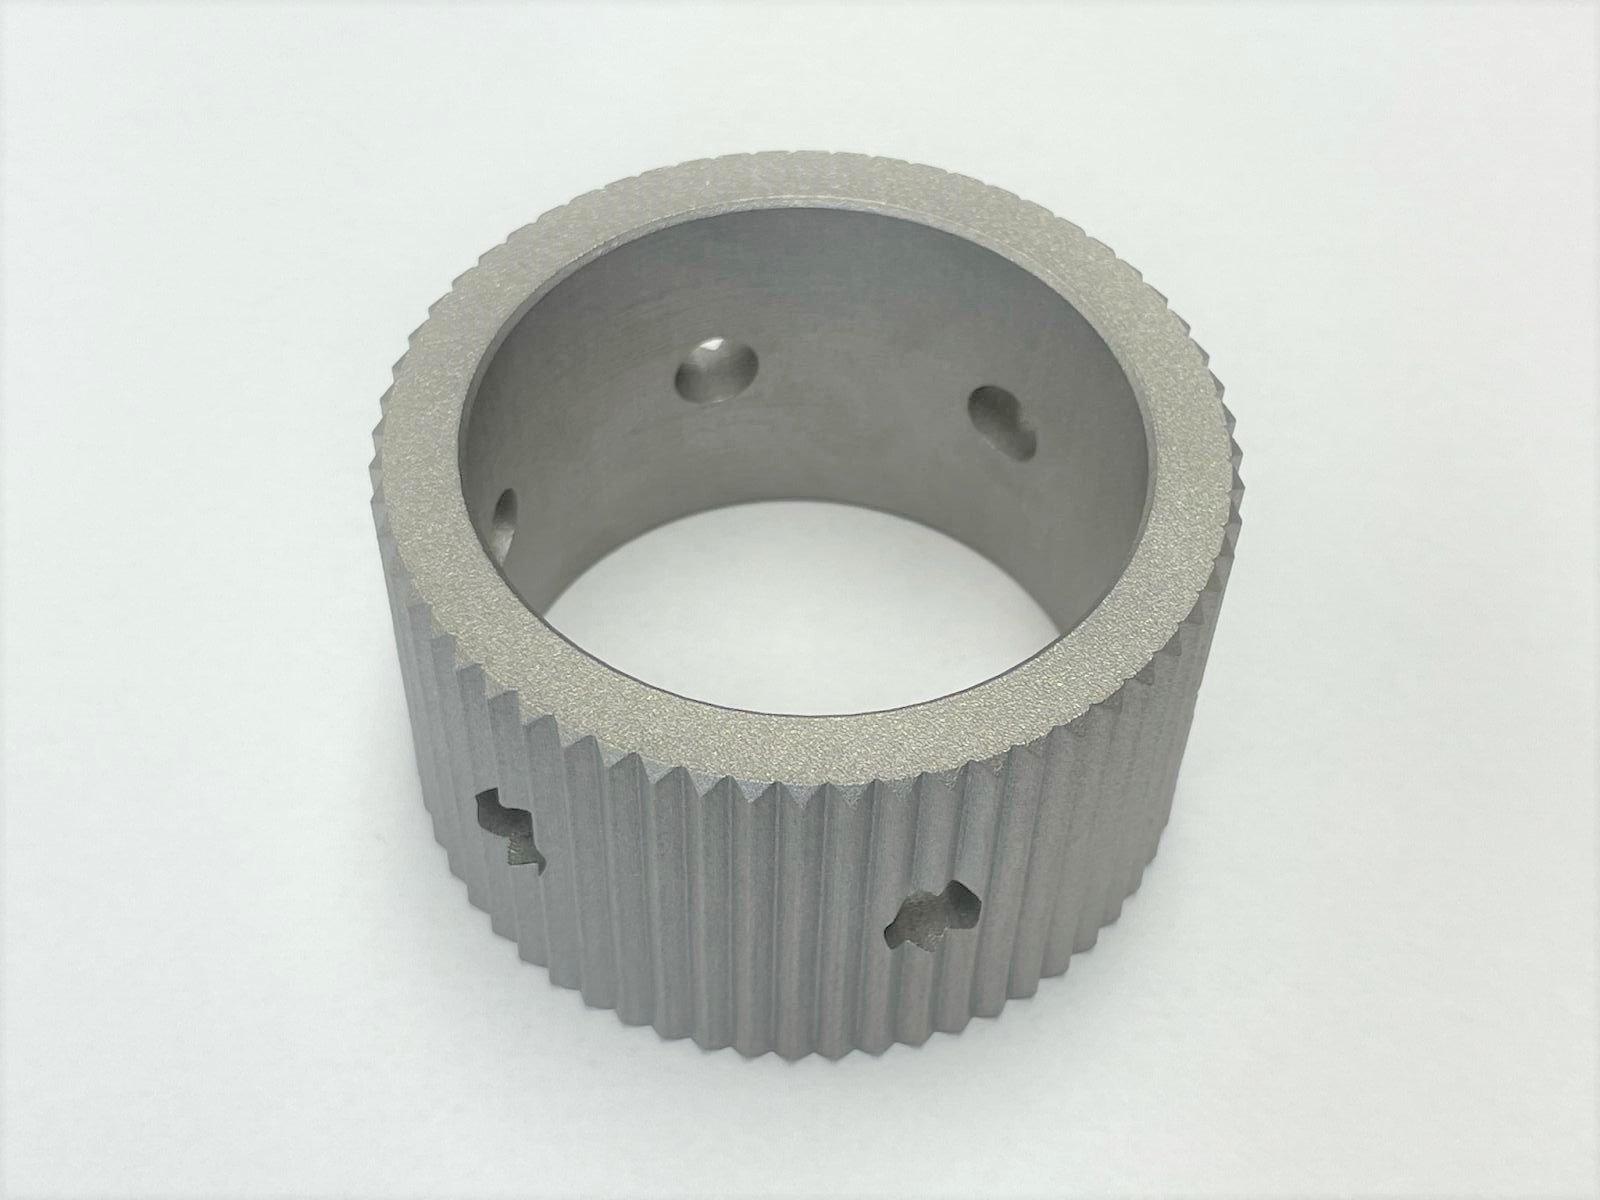 3d printed pump part